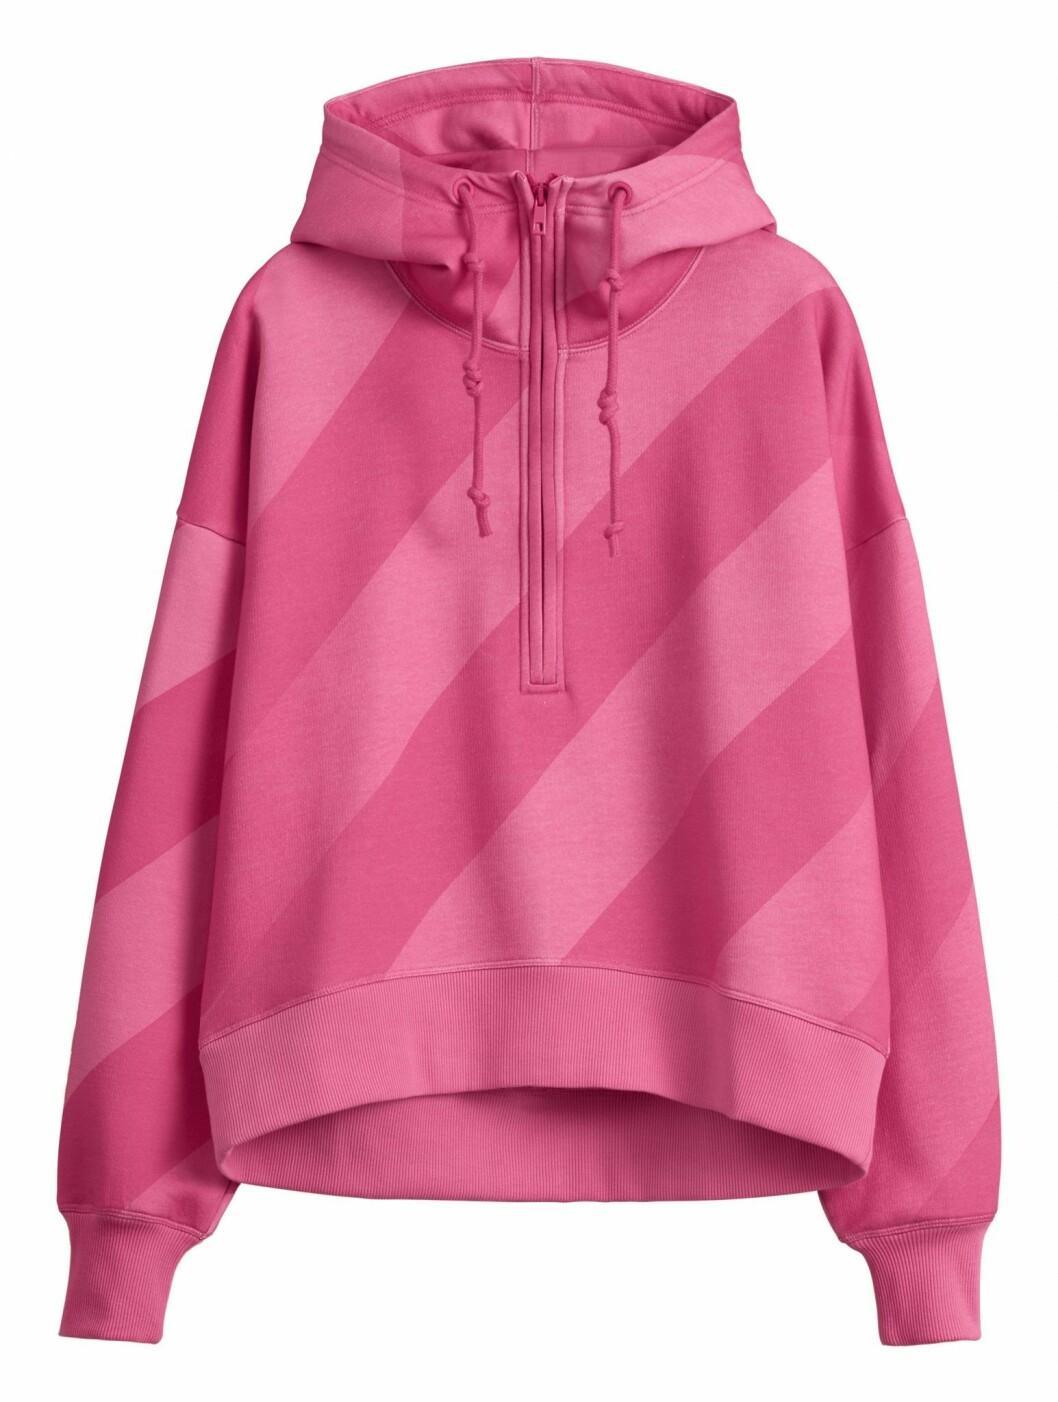 Rosa hoodie H&M Studio SS20